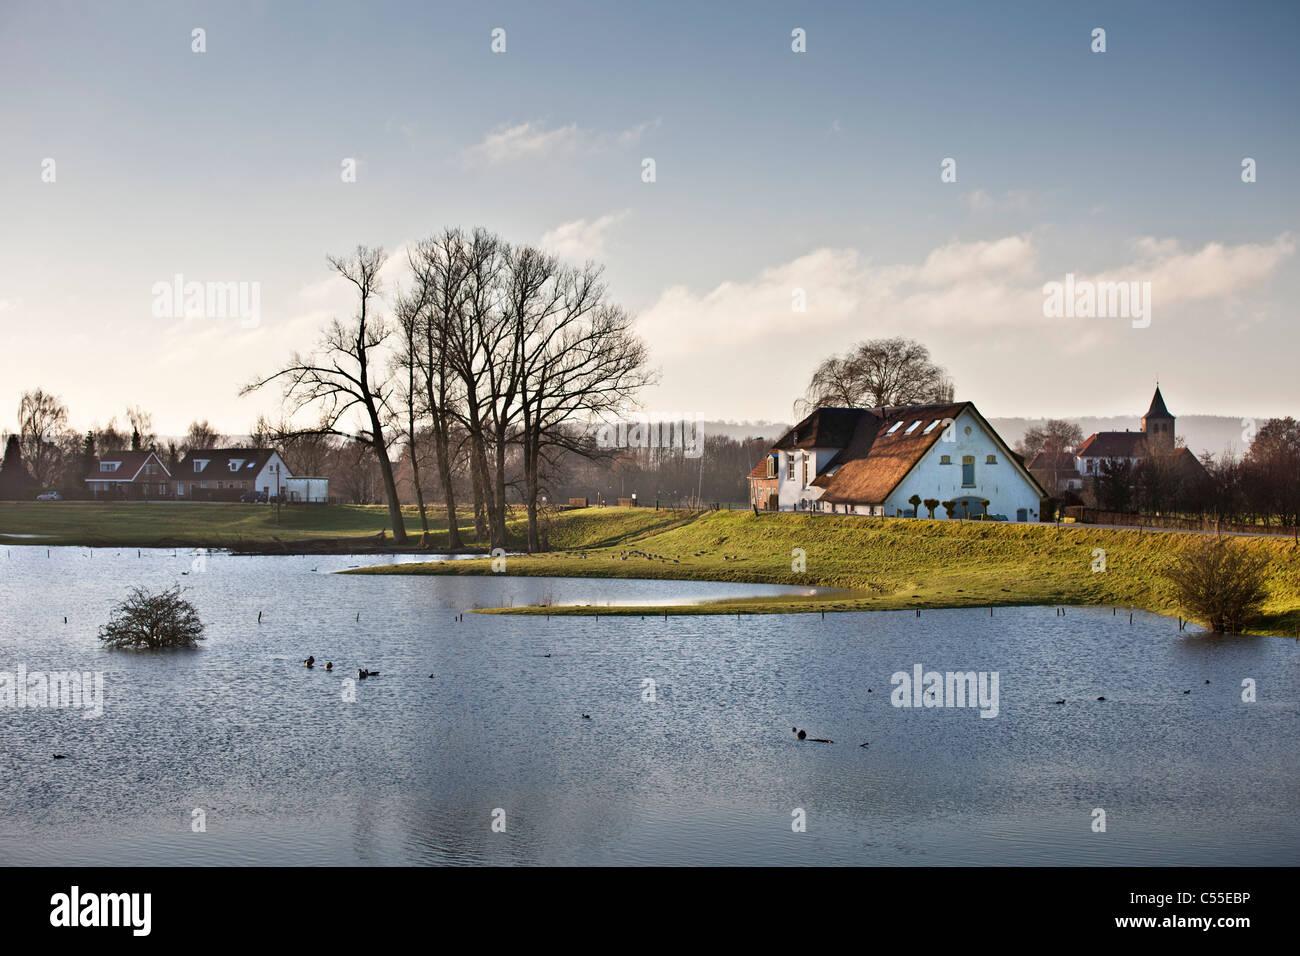 The Netherlands, near Nijmegen, High water level in river called Waal. dike Stock Photo